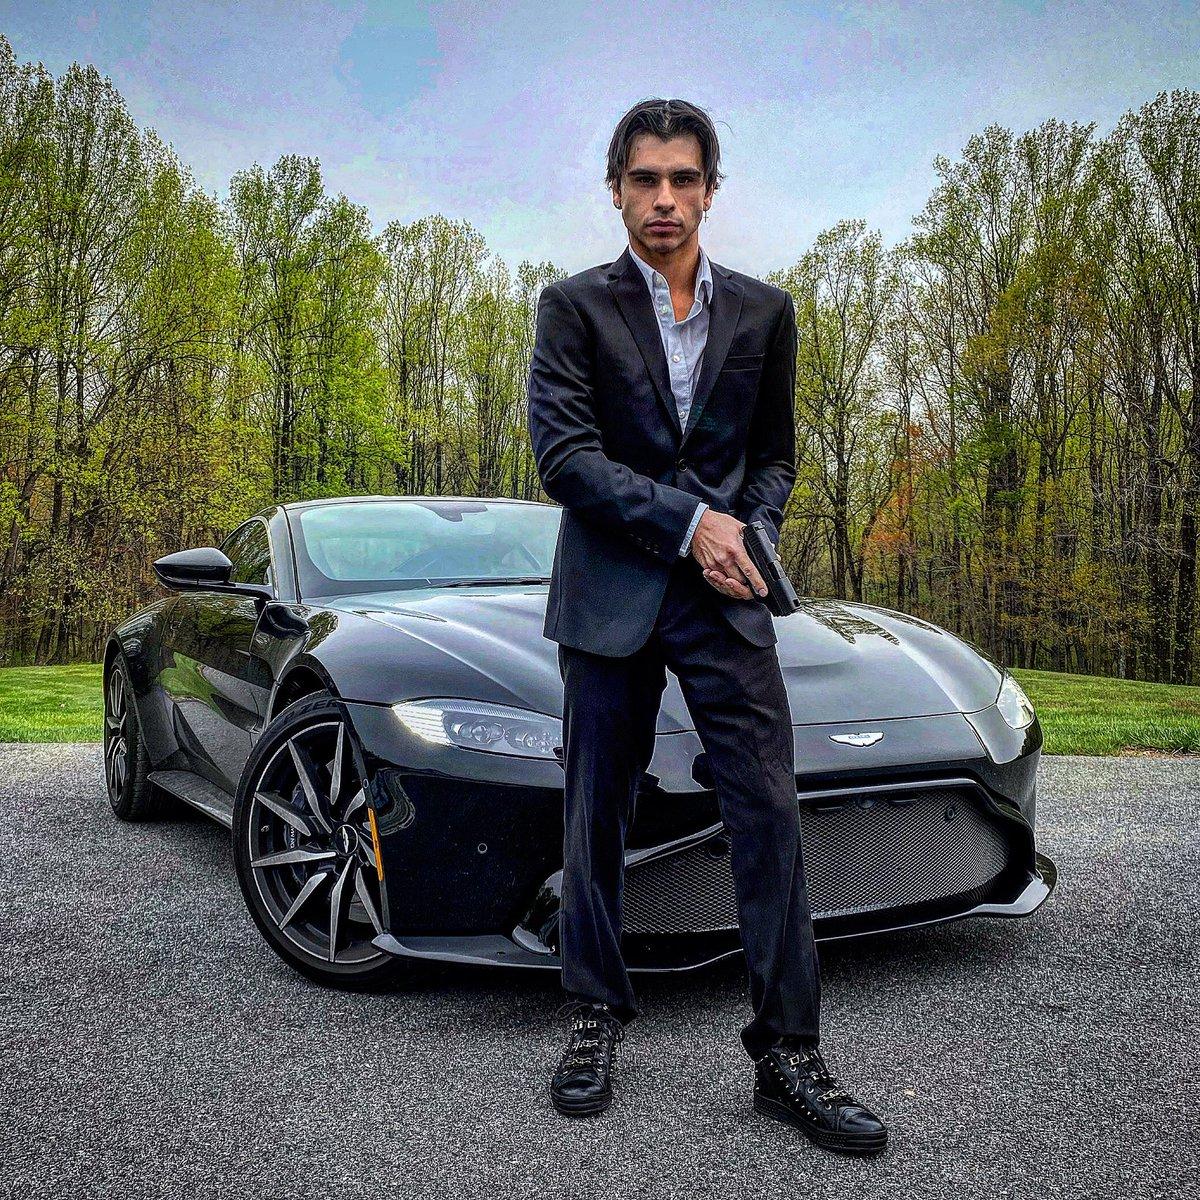 Uživatel Exclusive Auto Group Na Twitteru Cyrusdobre Of Youtube S Dobrebrothers Gives Us His Best Jamesbond Impression Posing With His New Astonmartin Vantage From Aston Martin Washington D C Astonmartinamericas Astonmartinlagonda